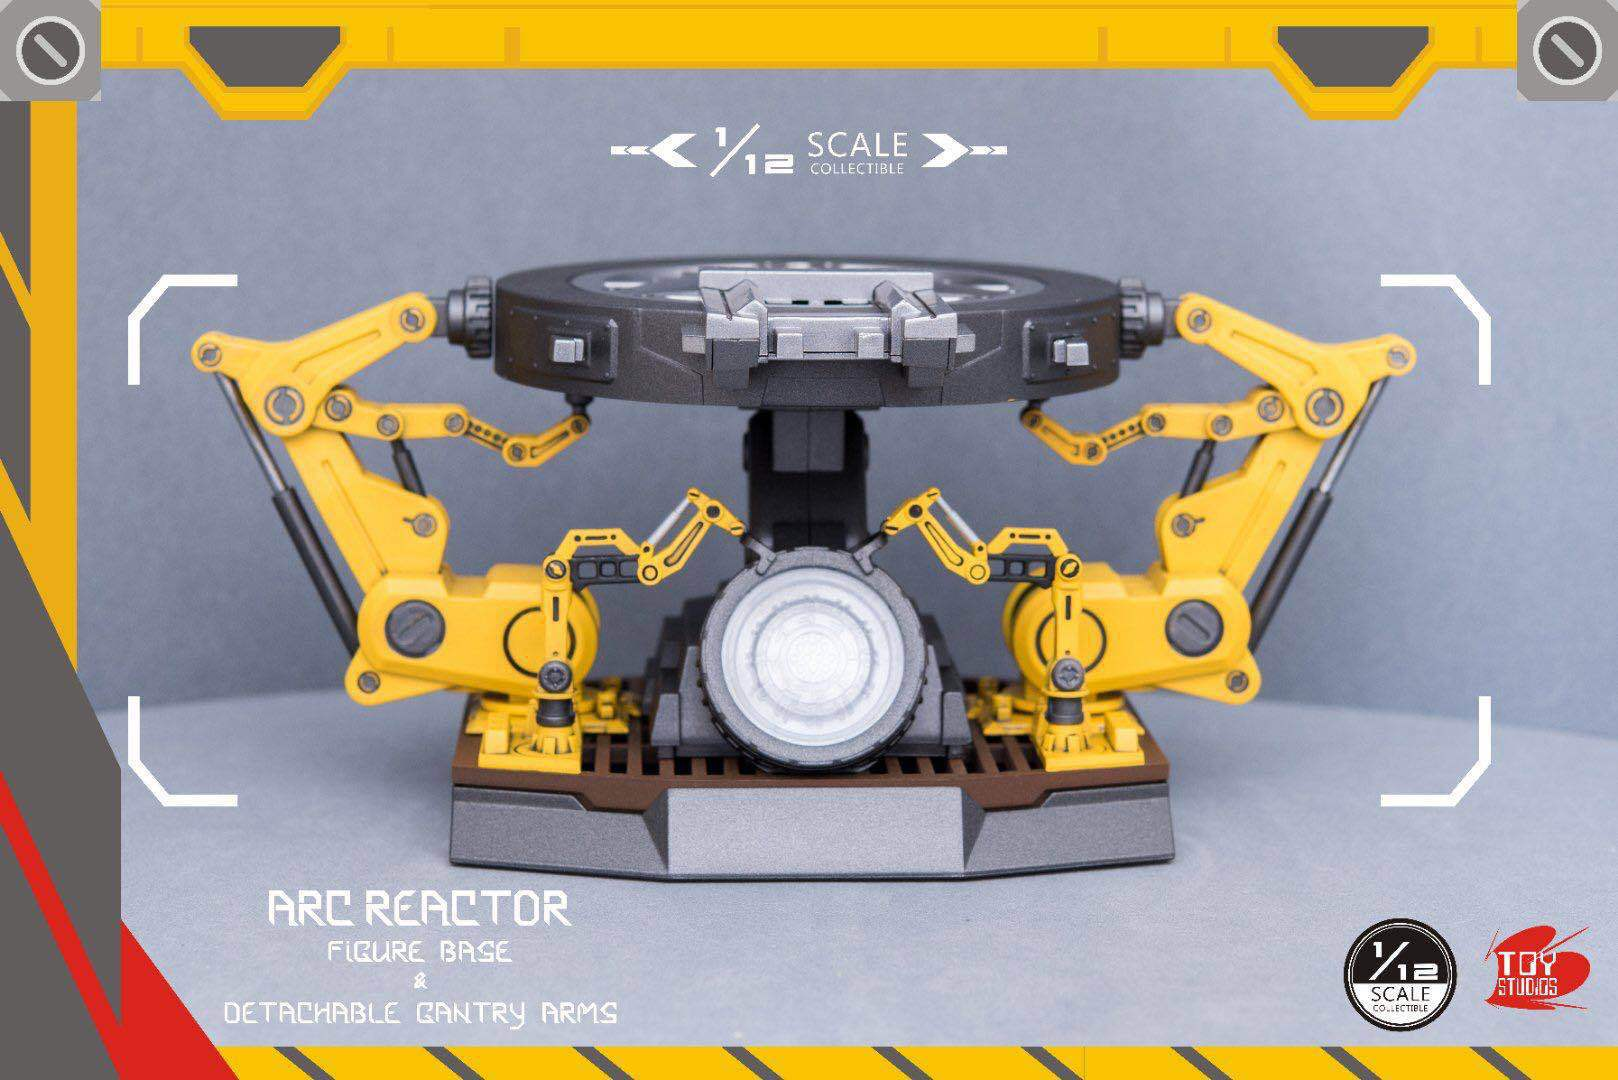 Iron Man Arc Reactor 1/12 Scale Figure Base & Detachable Gantry Arms with Light